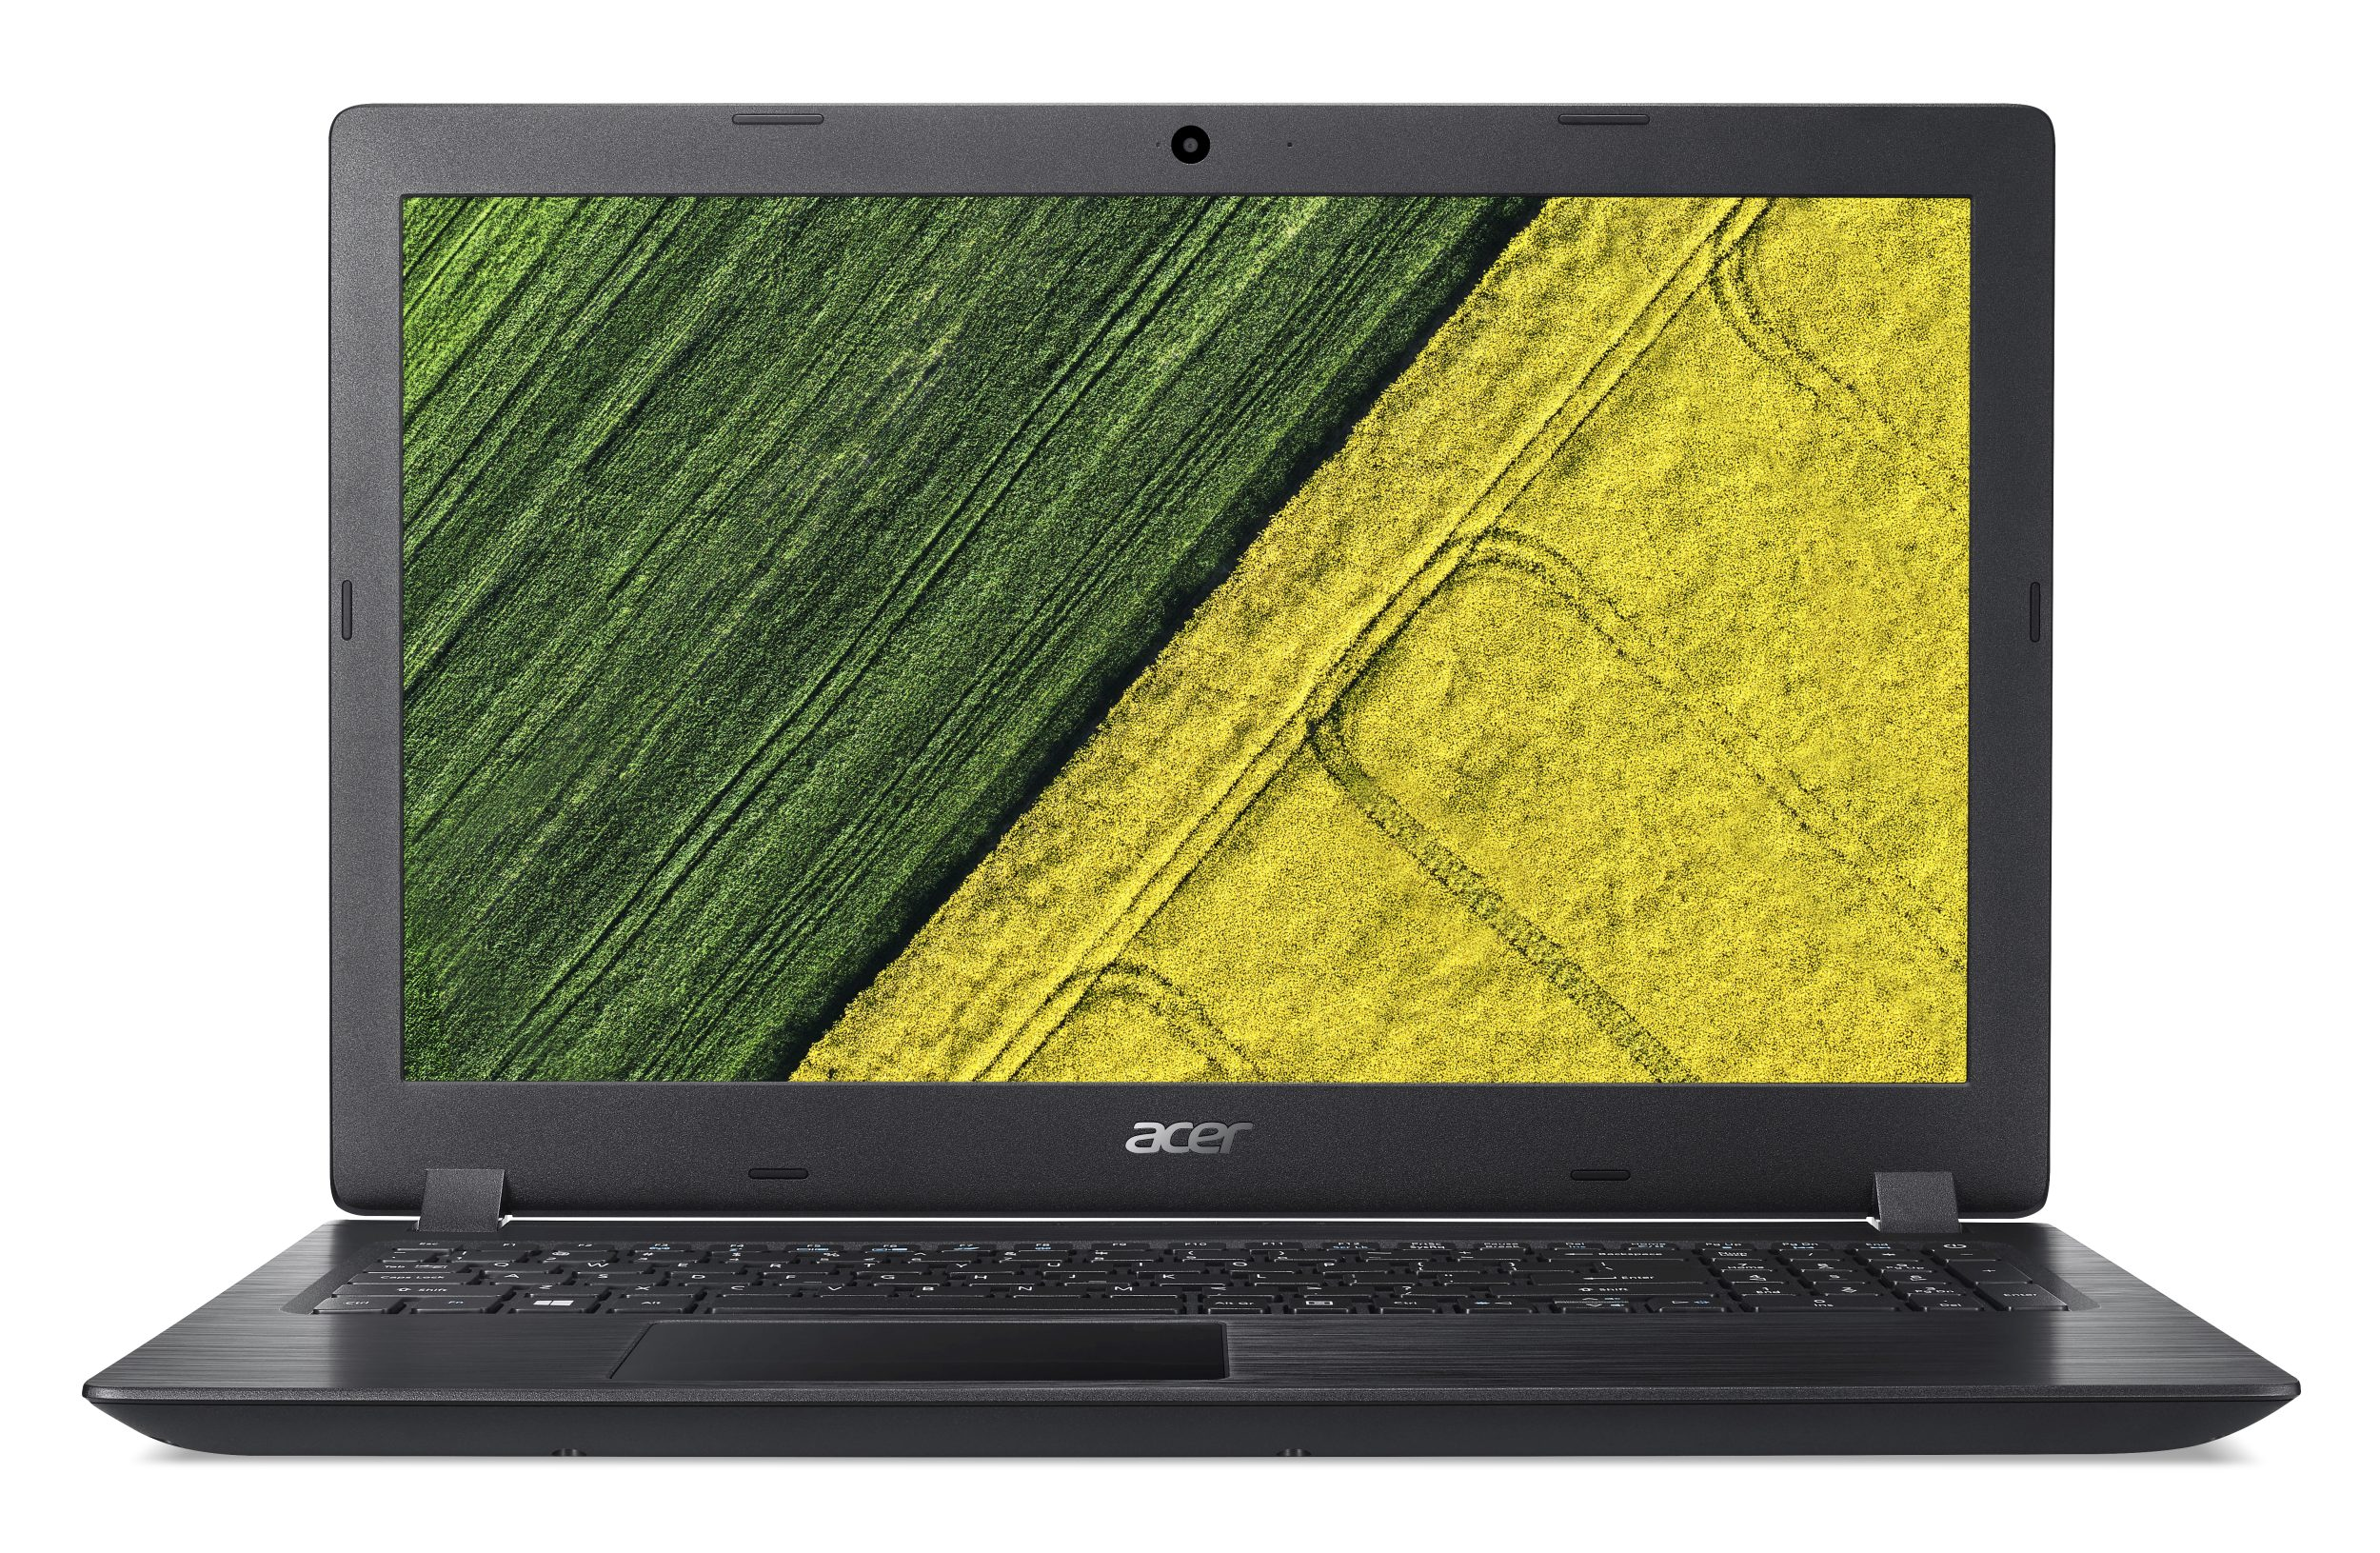 "Acer Aspire 3 (A315-21-991J) AMD A9-9420/4GB+N/256GB SSD M.2+N/AMD Radeon Graphics/15.6"" FHD LED matný/W10 Home/Black"